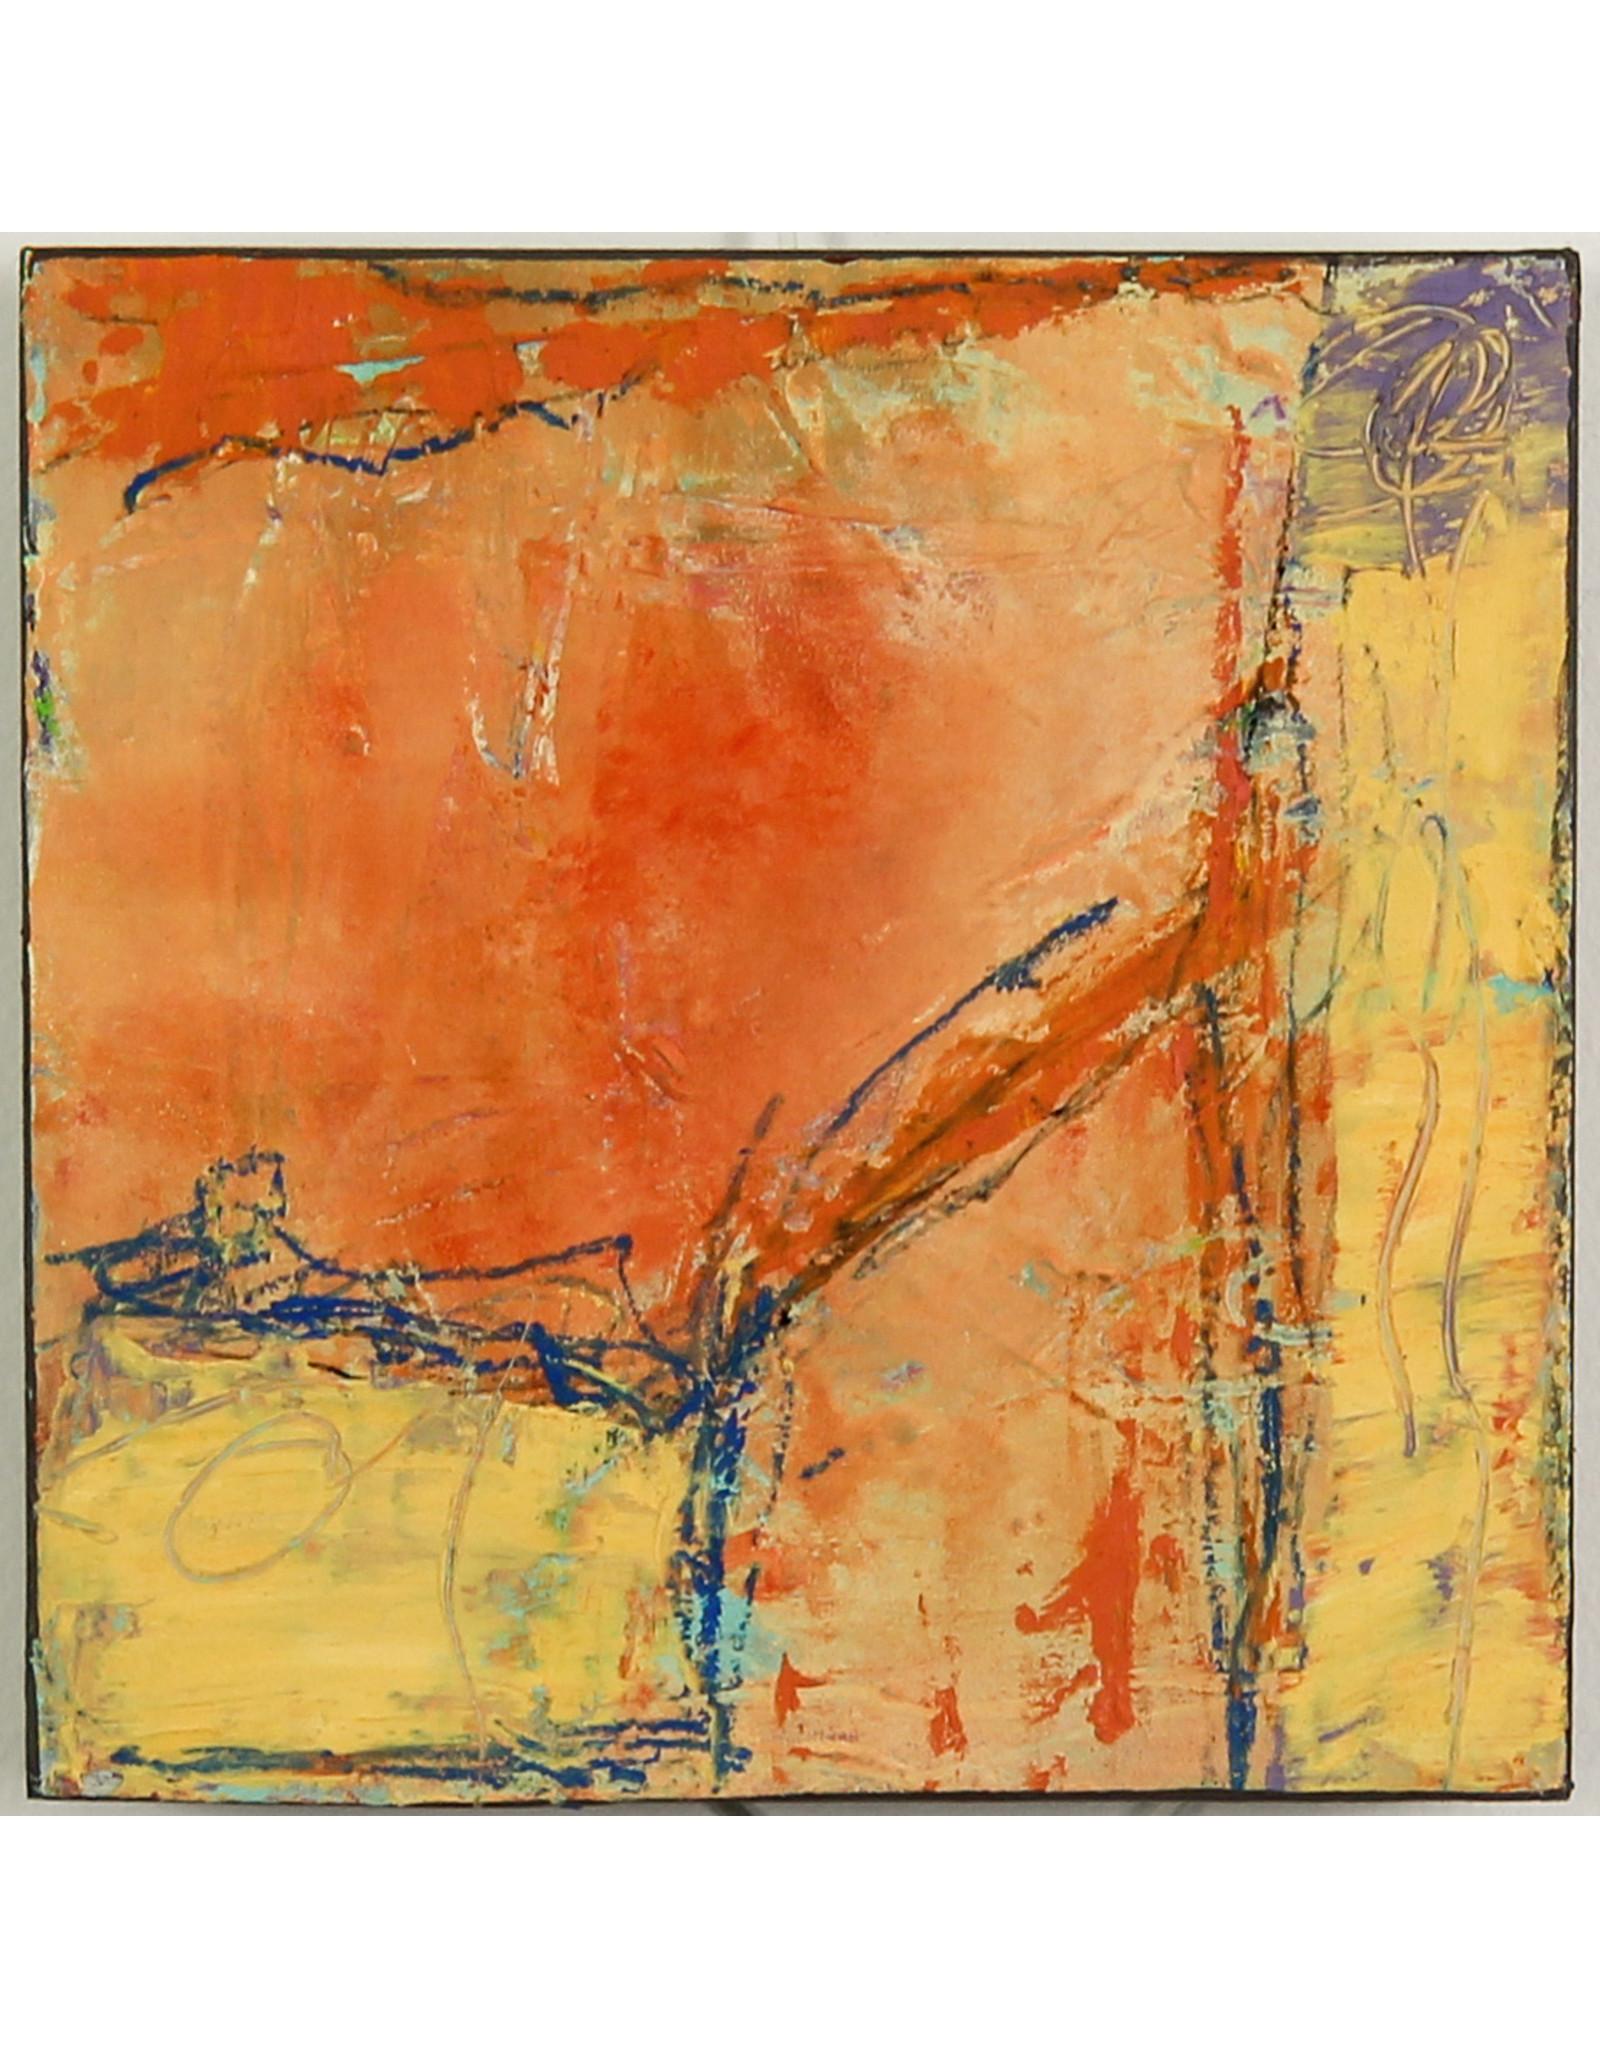 Linda Wright Peach Blush by Linda Wright